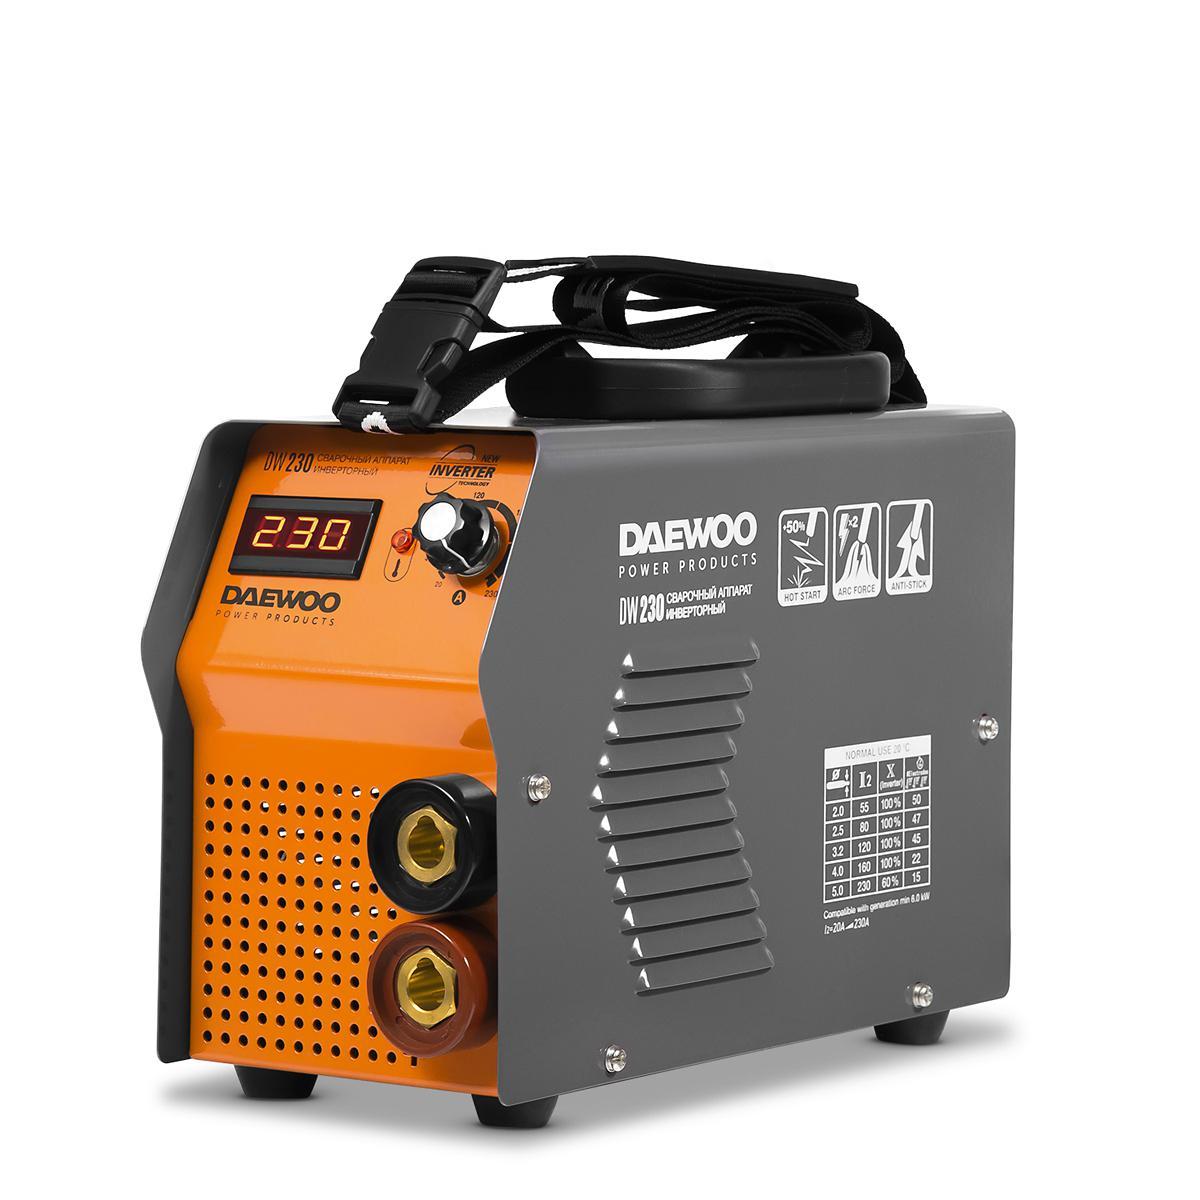 Сварочный аппарат Daewoo Dw 230 сварочный аппарат daewoo dw 170